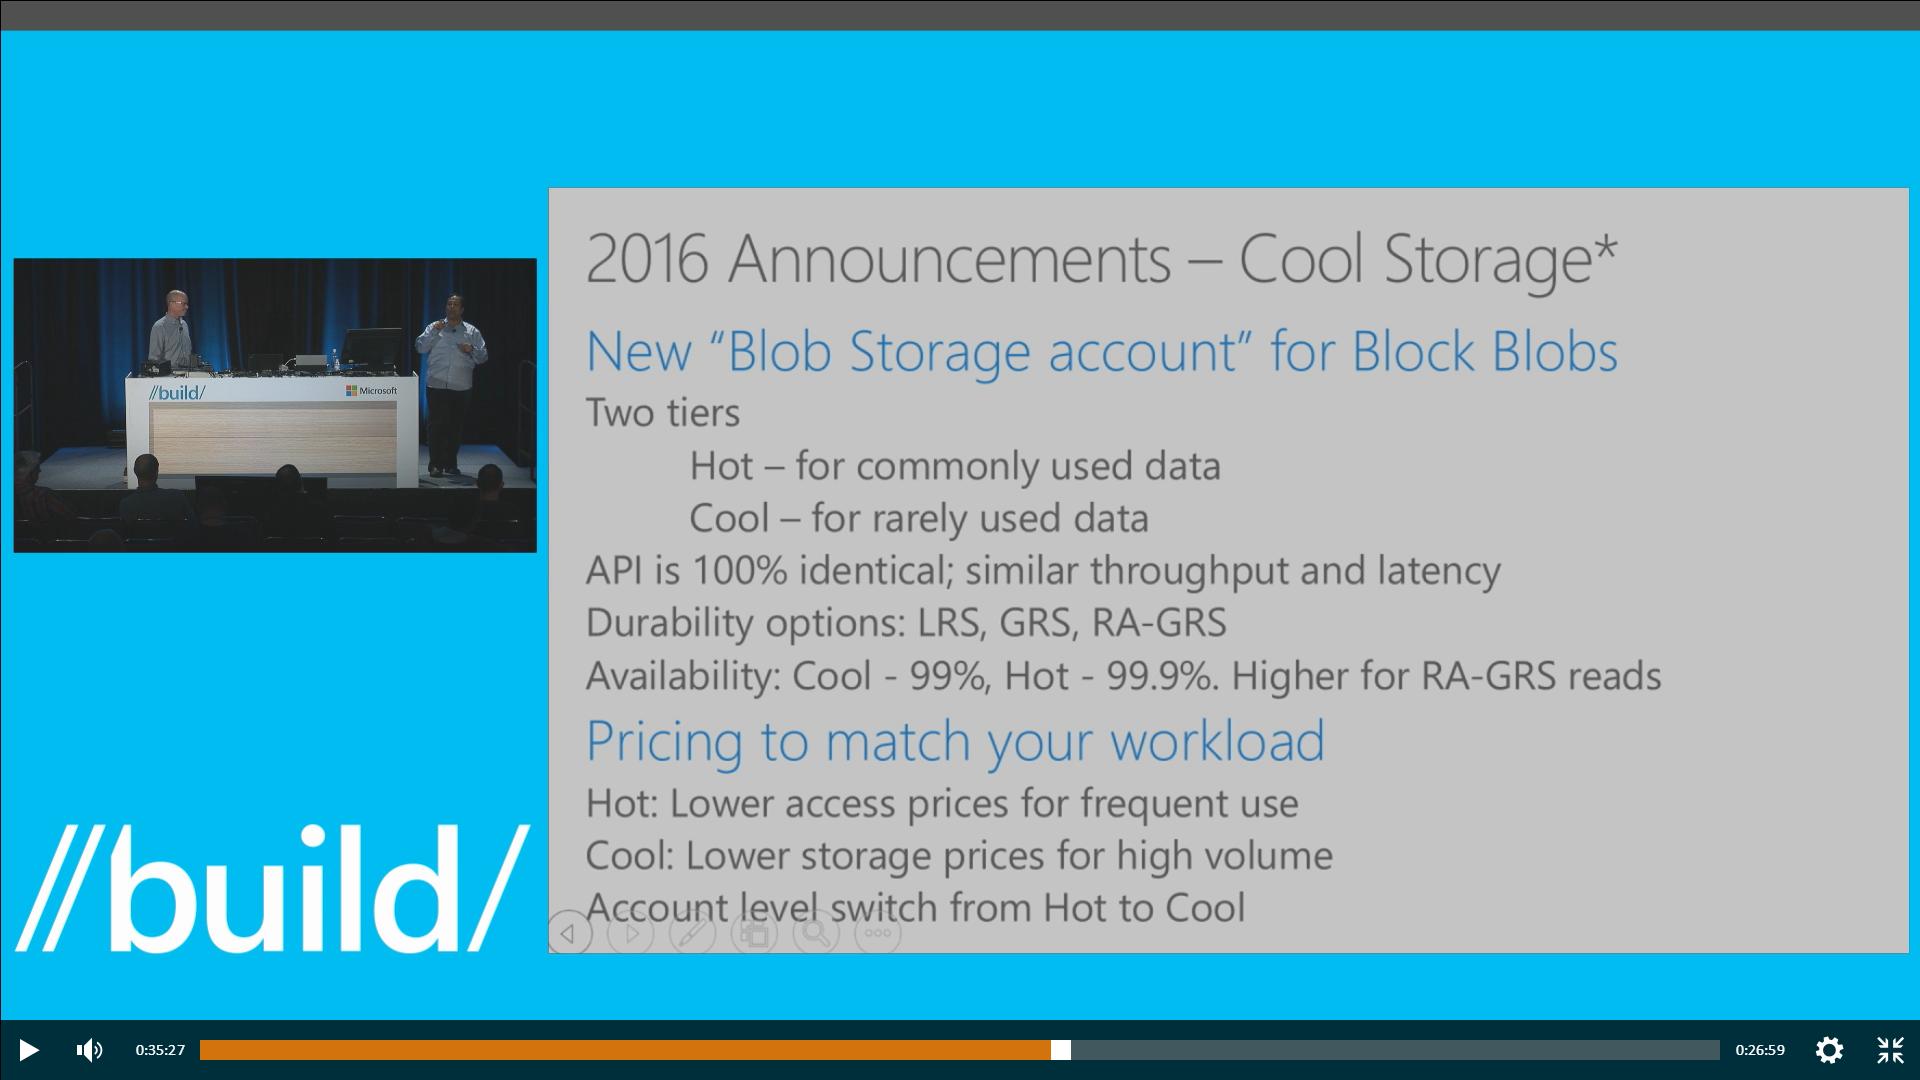 Cool Storage